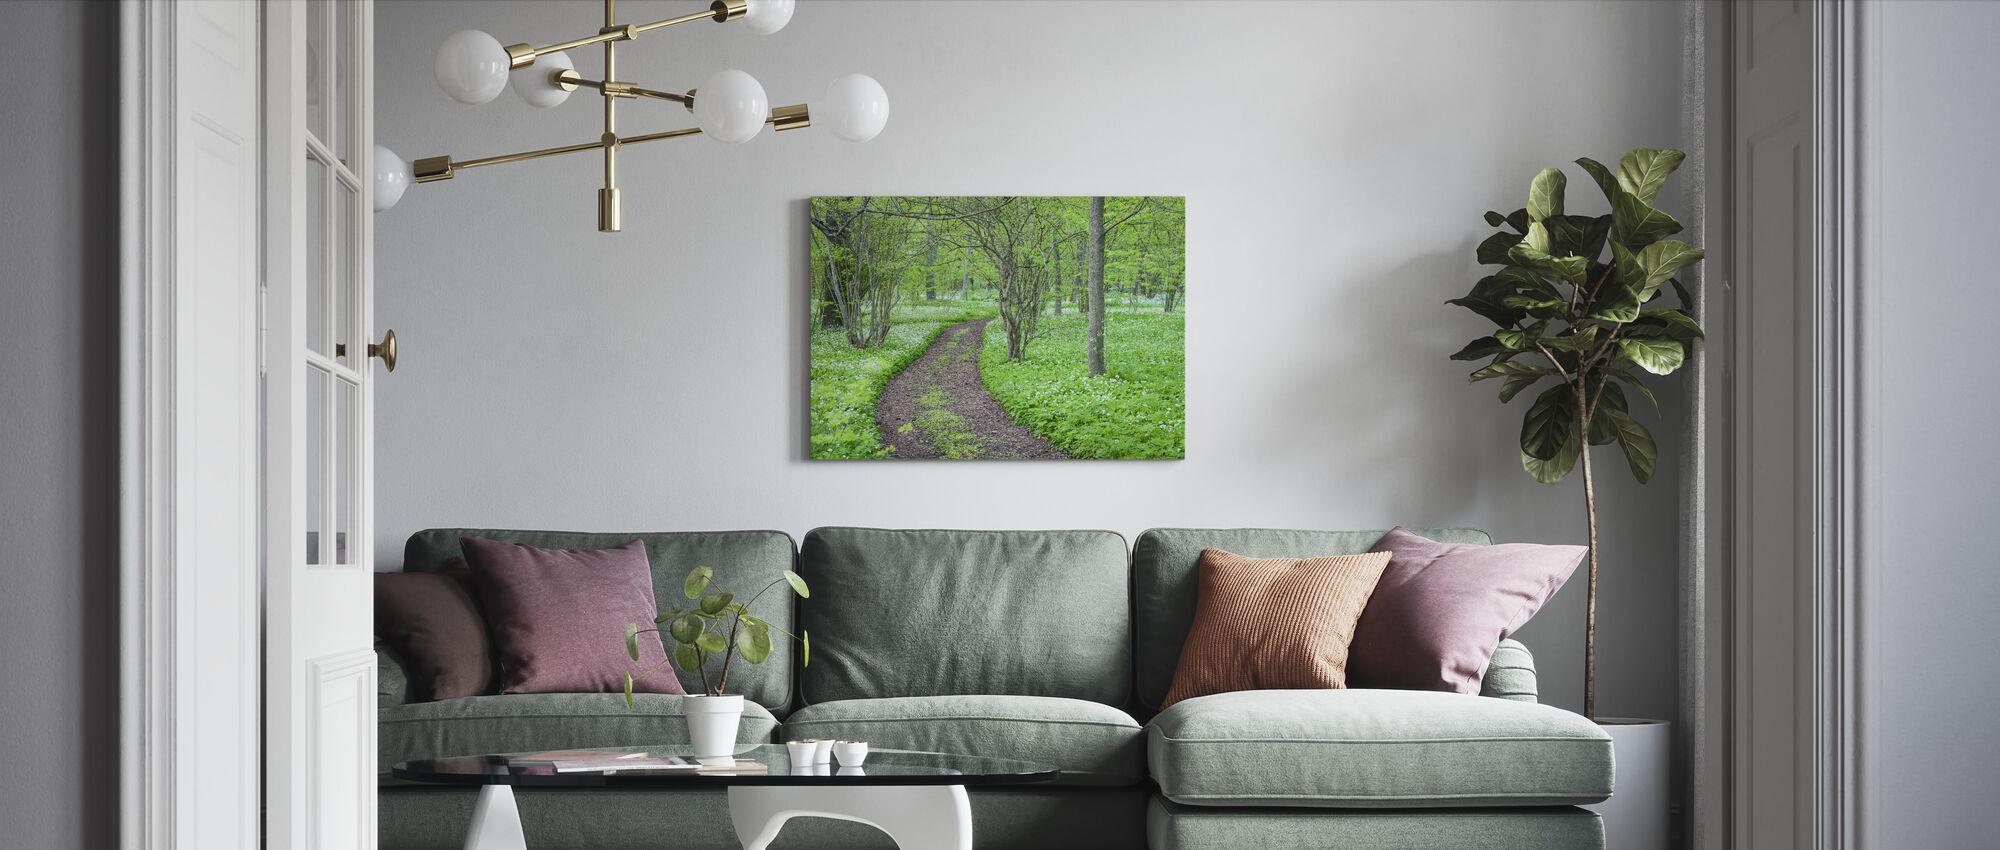 Green Park - Canvastavla - Vardagsrum